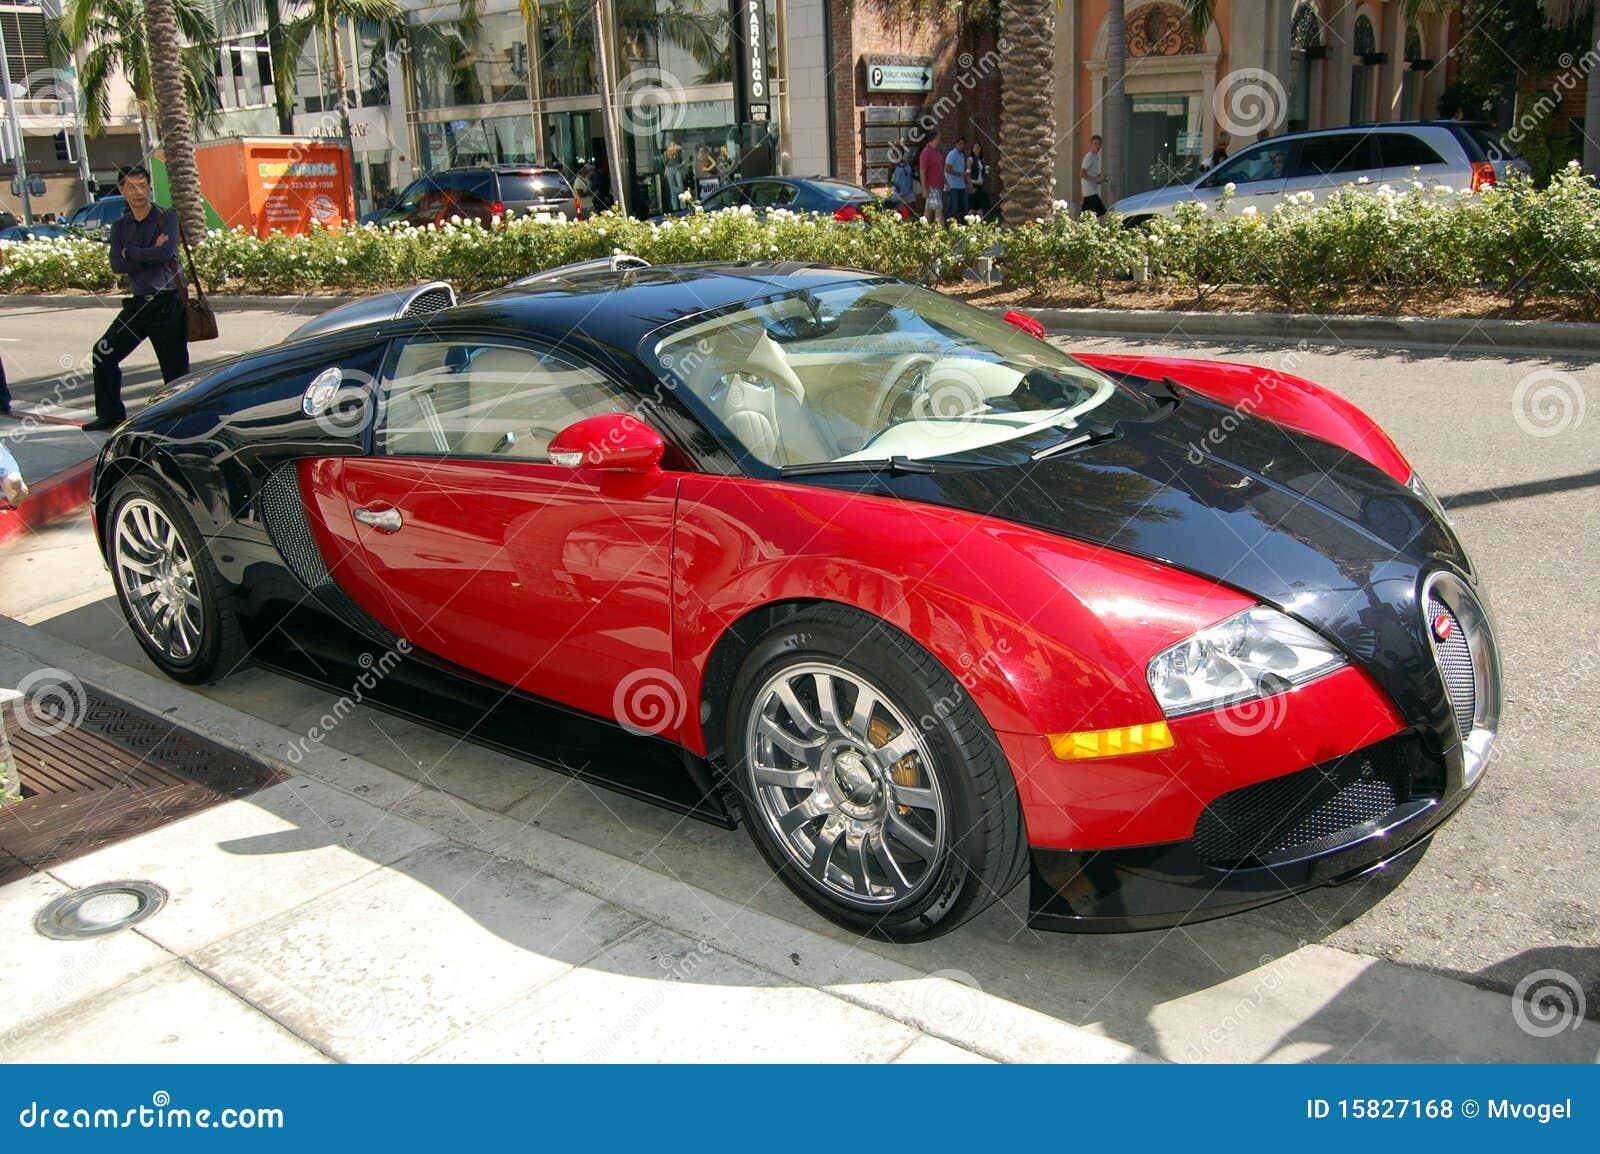 how to drive a bugatti